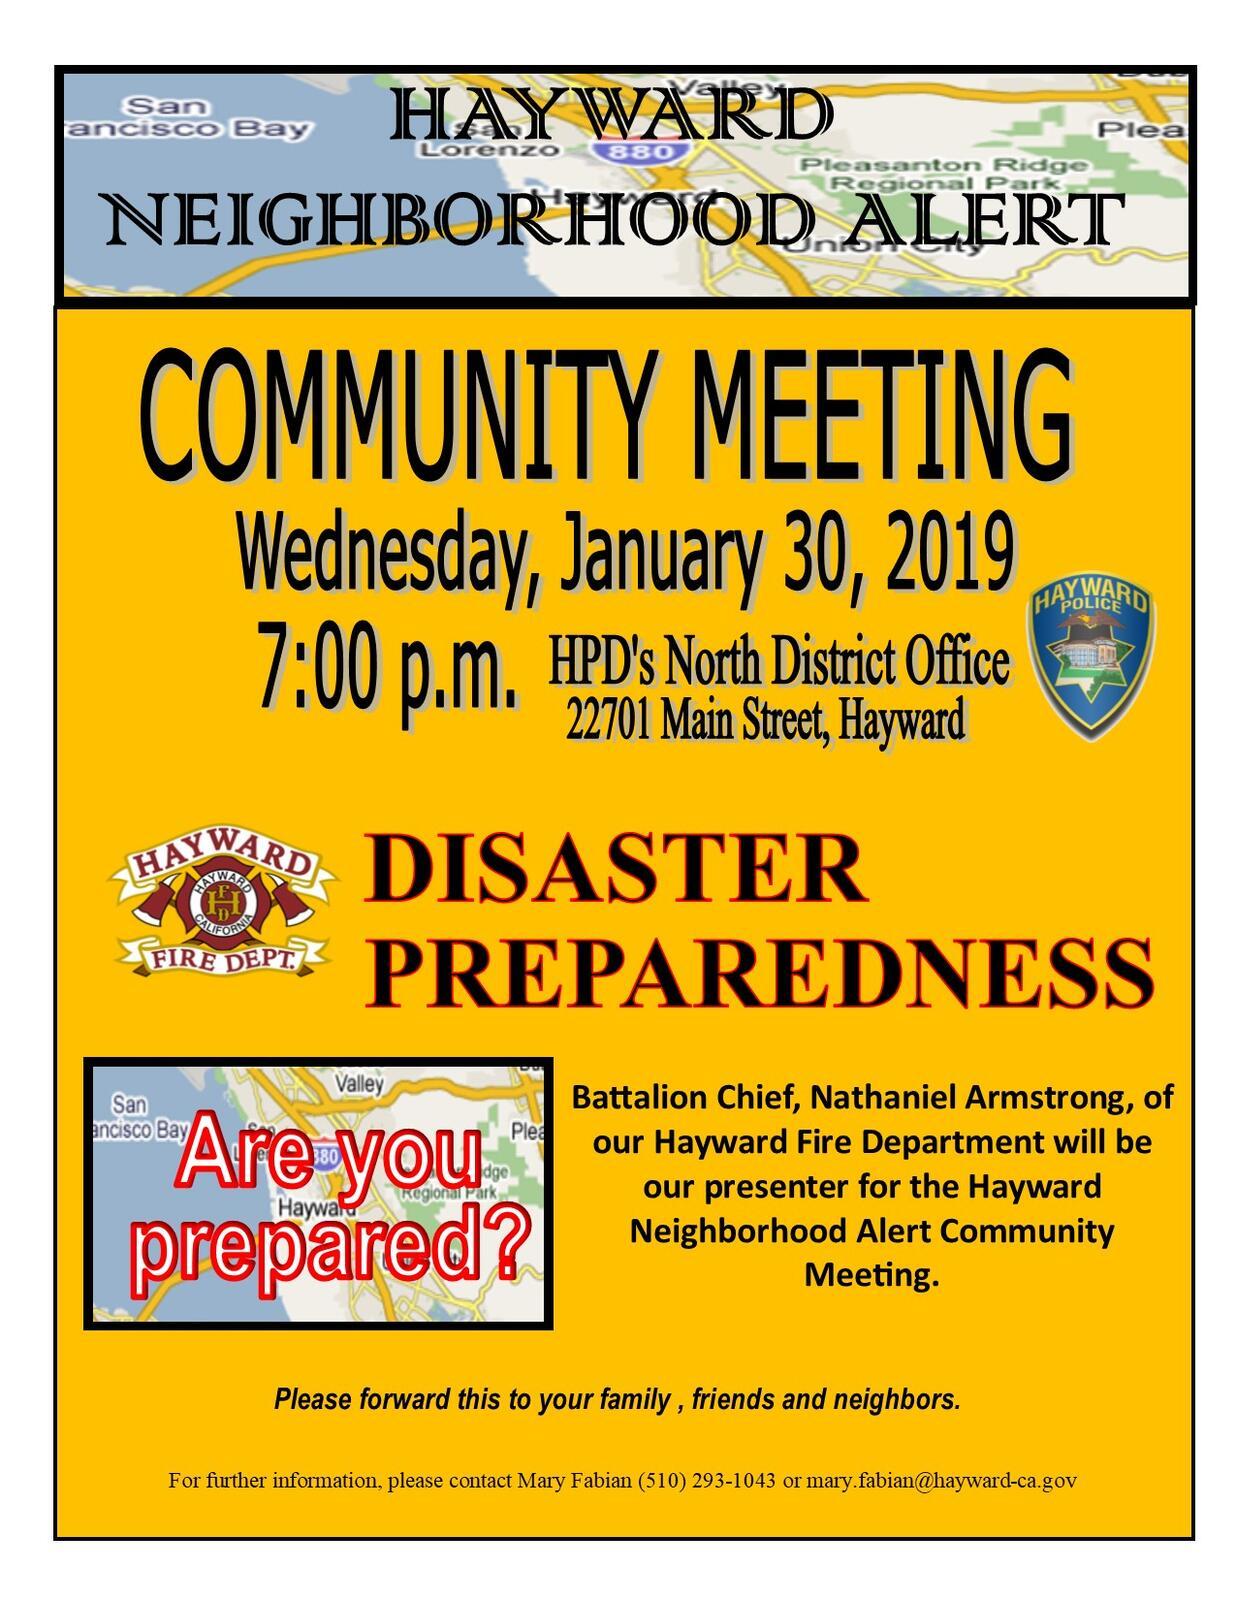 HAYWARD NEIGHBORHOOD ALERT - Community Meeting - January